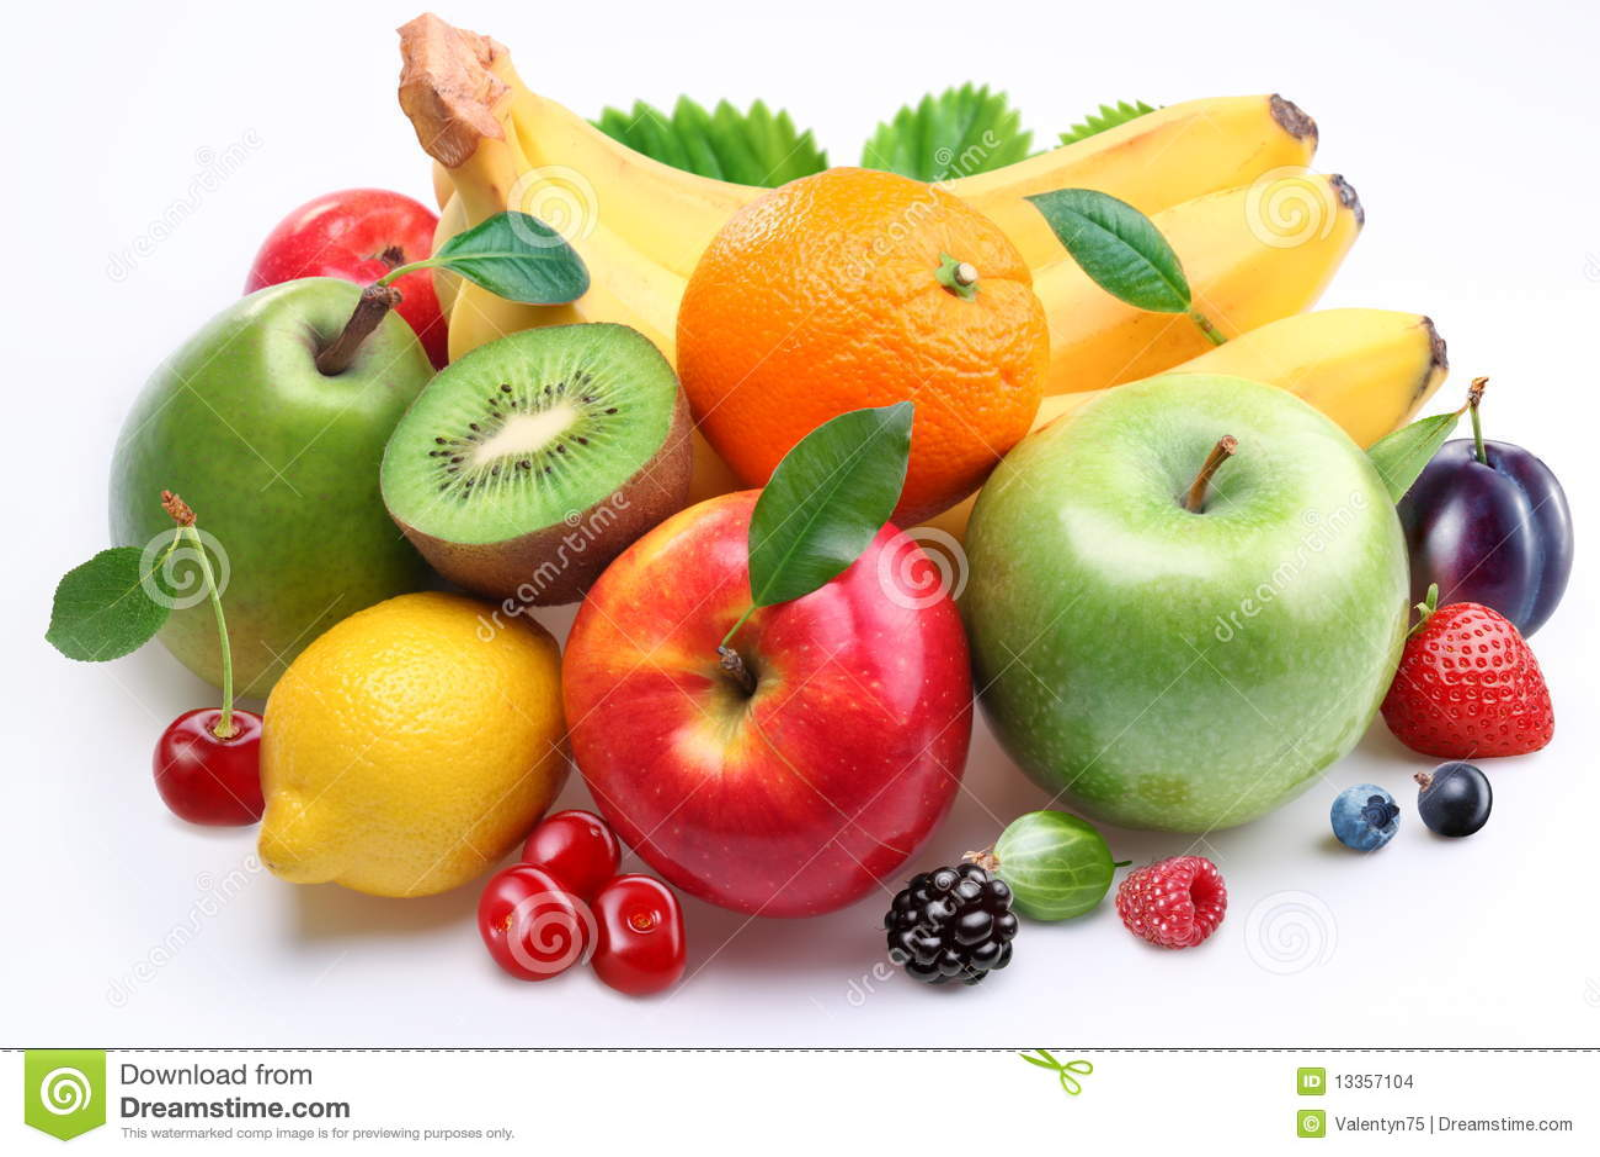 Handful of fruit and berries